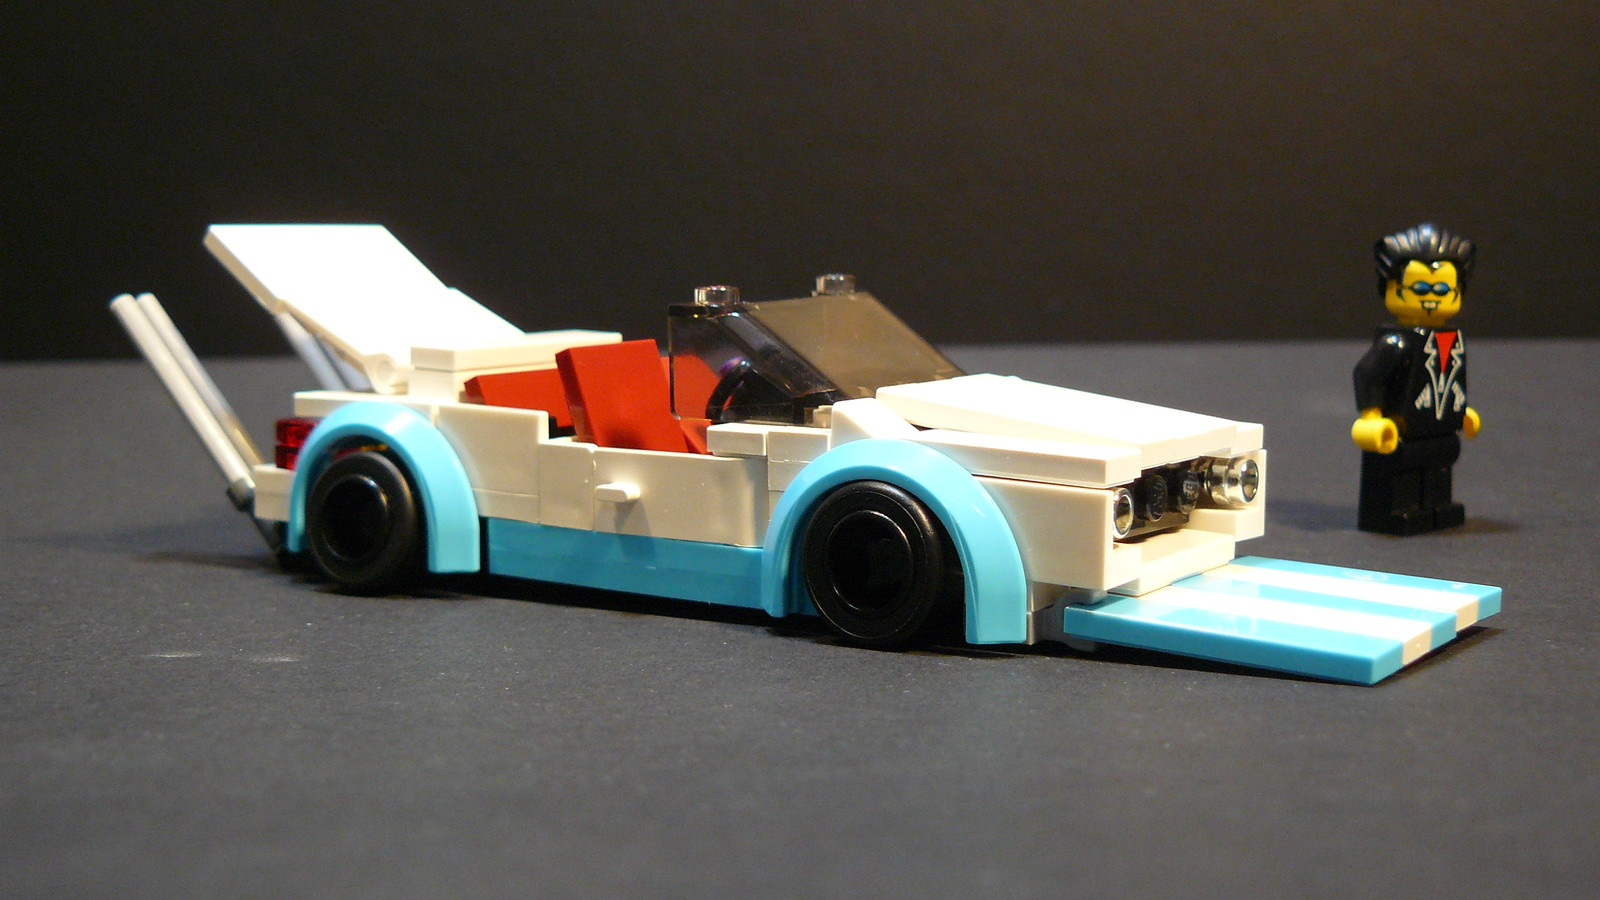 Lego Cars Flickr